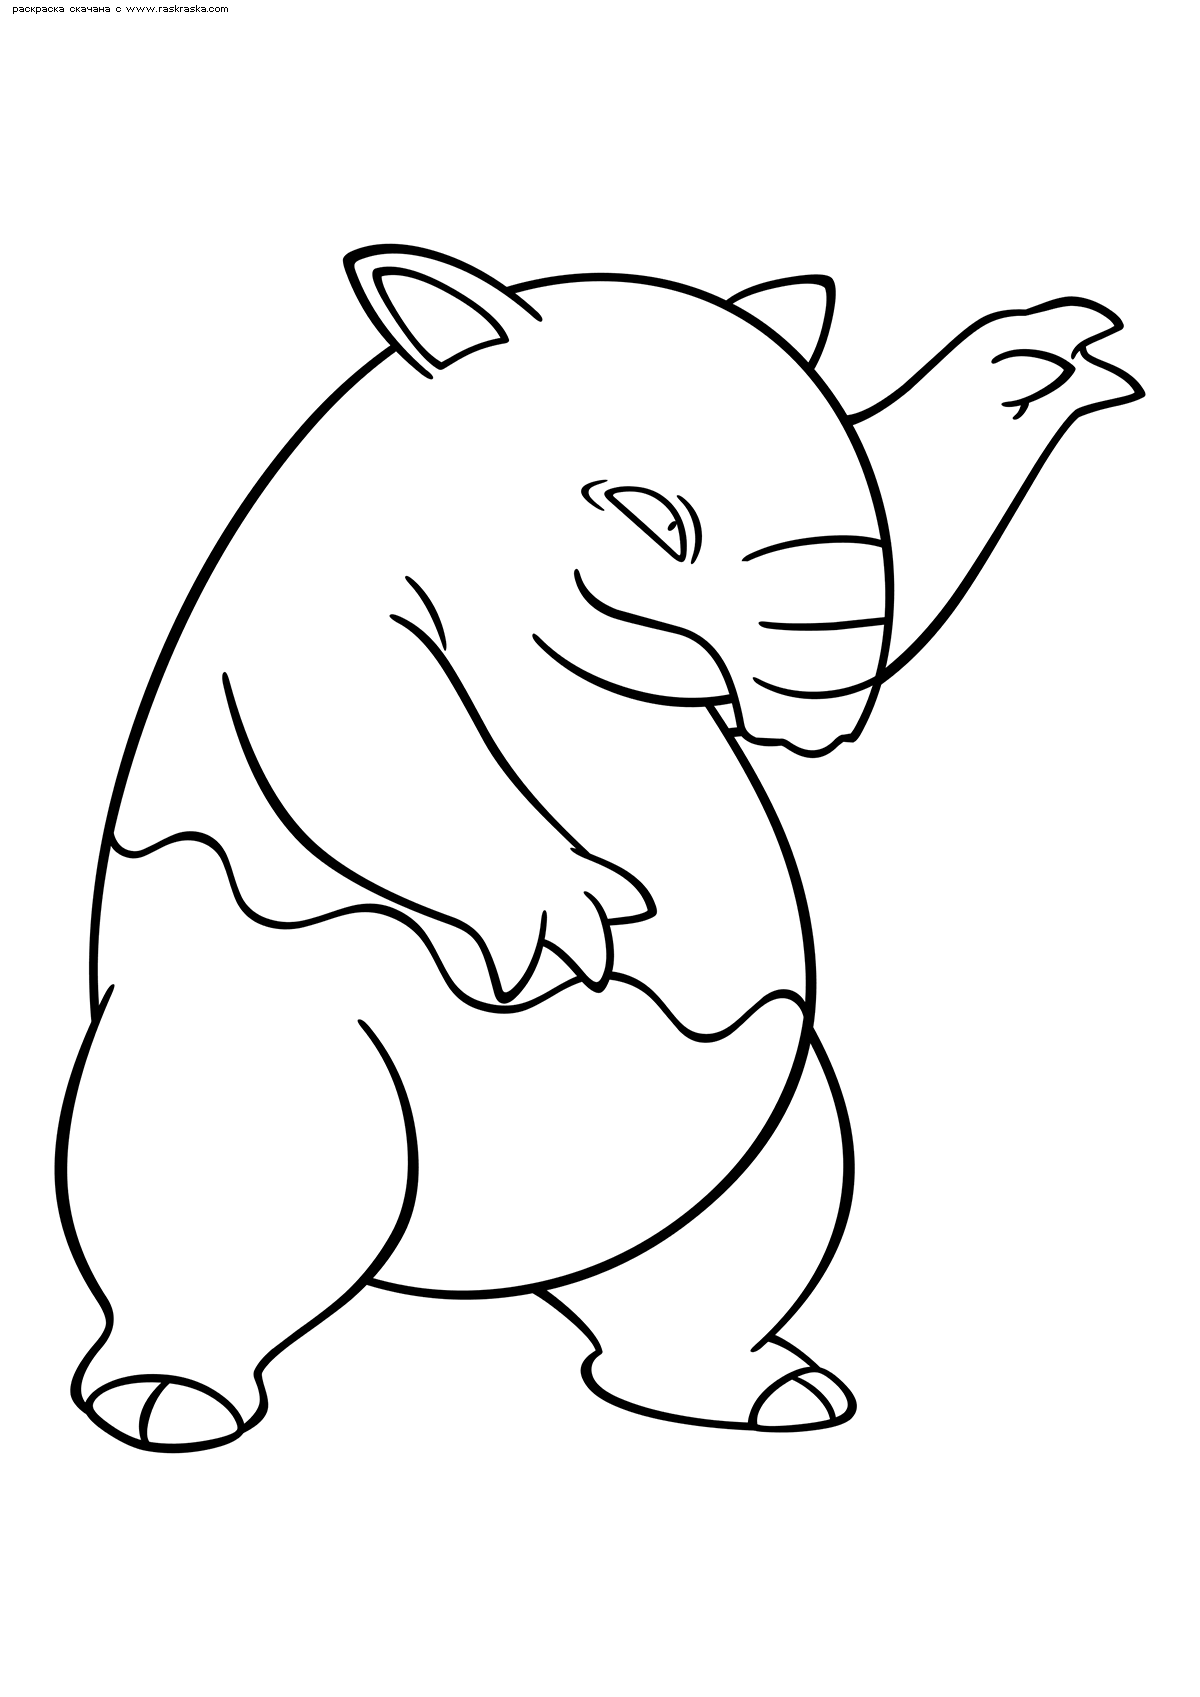 Раскраска Покемон Дроузи (Drowzee) | Раскраски эволюция ...